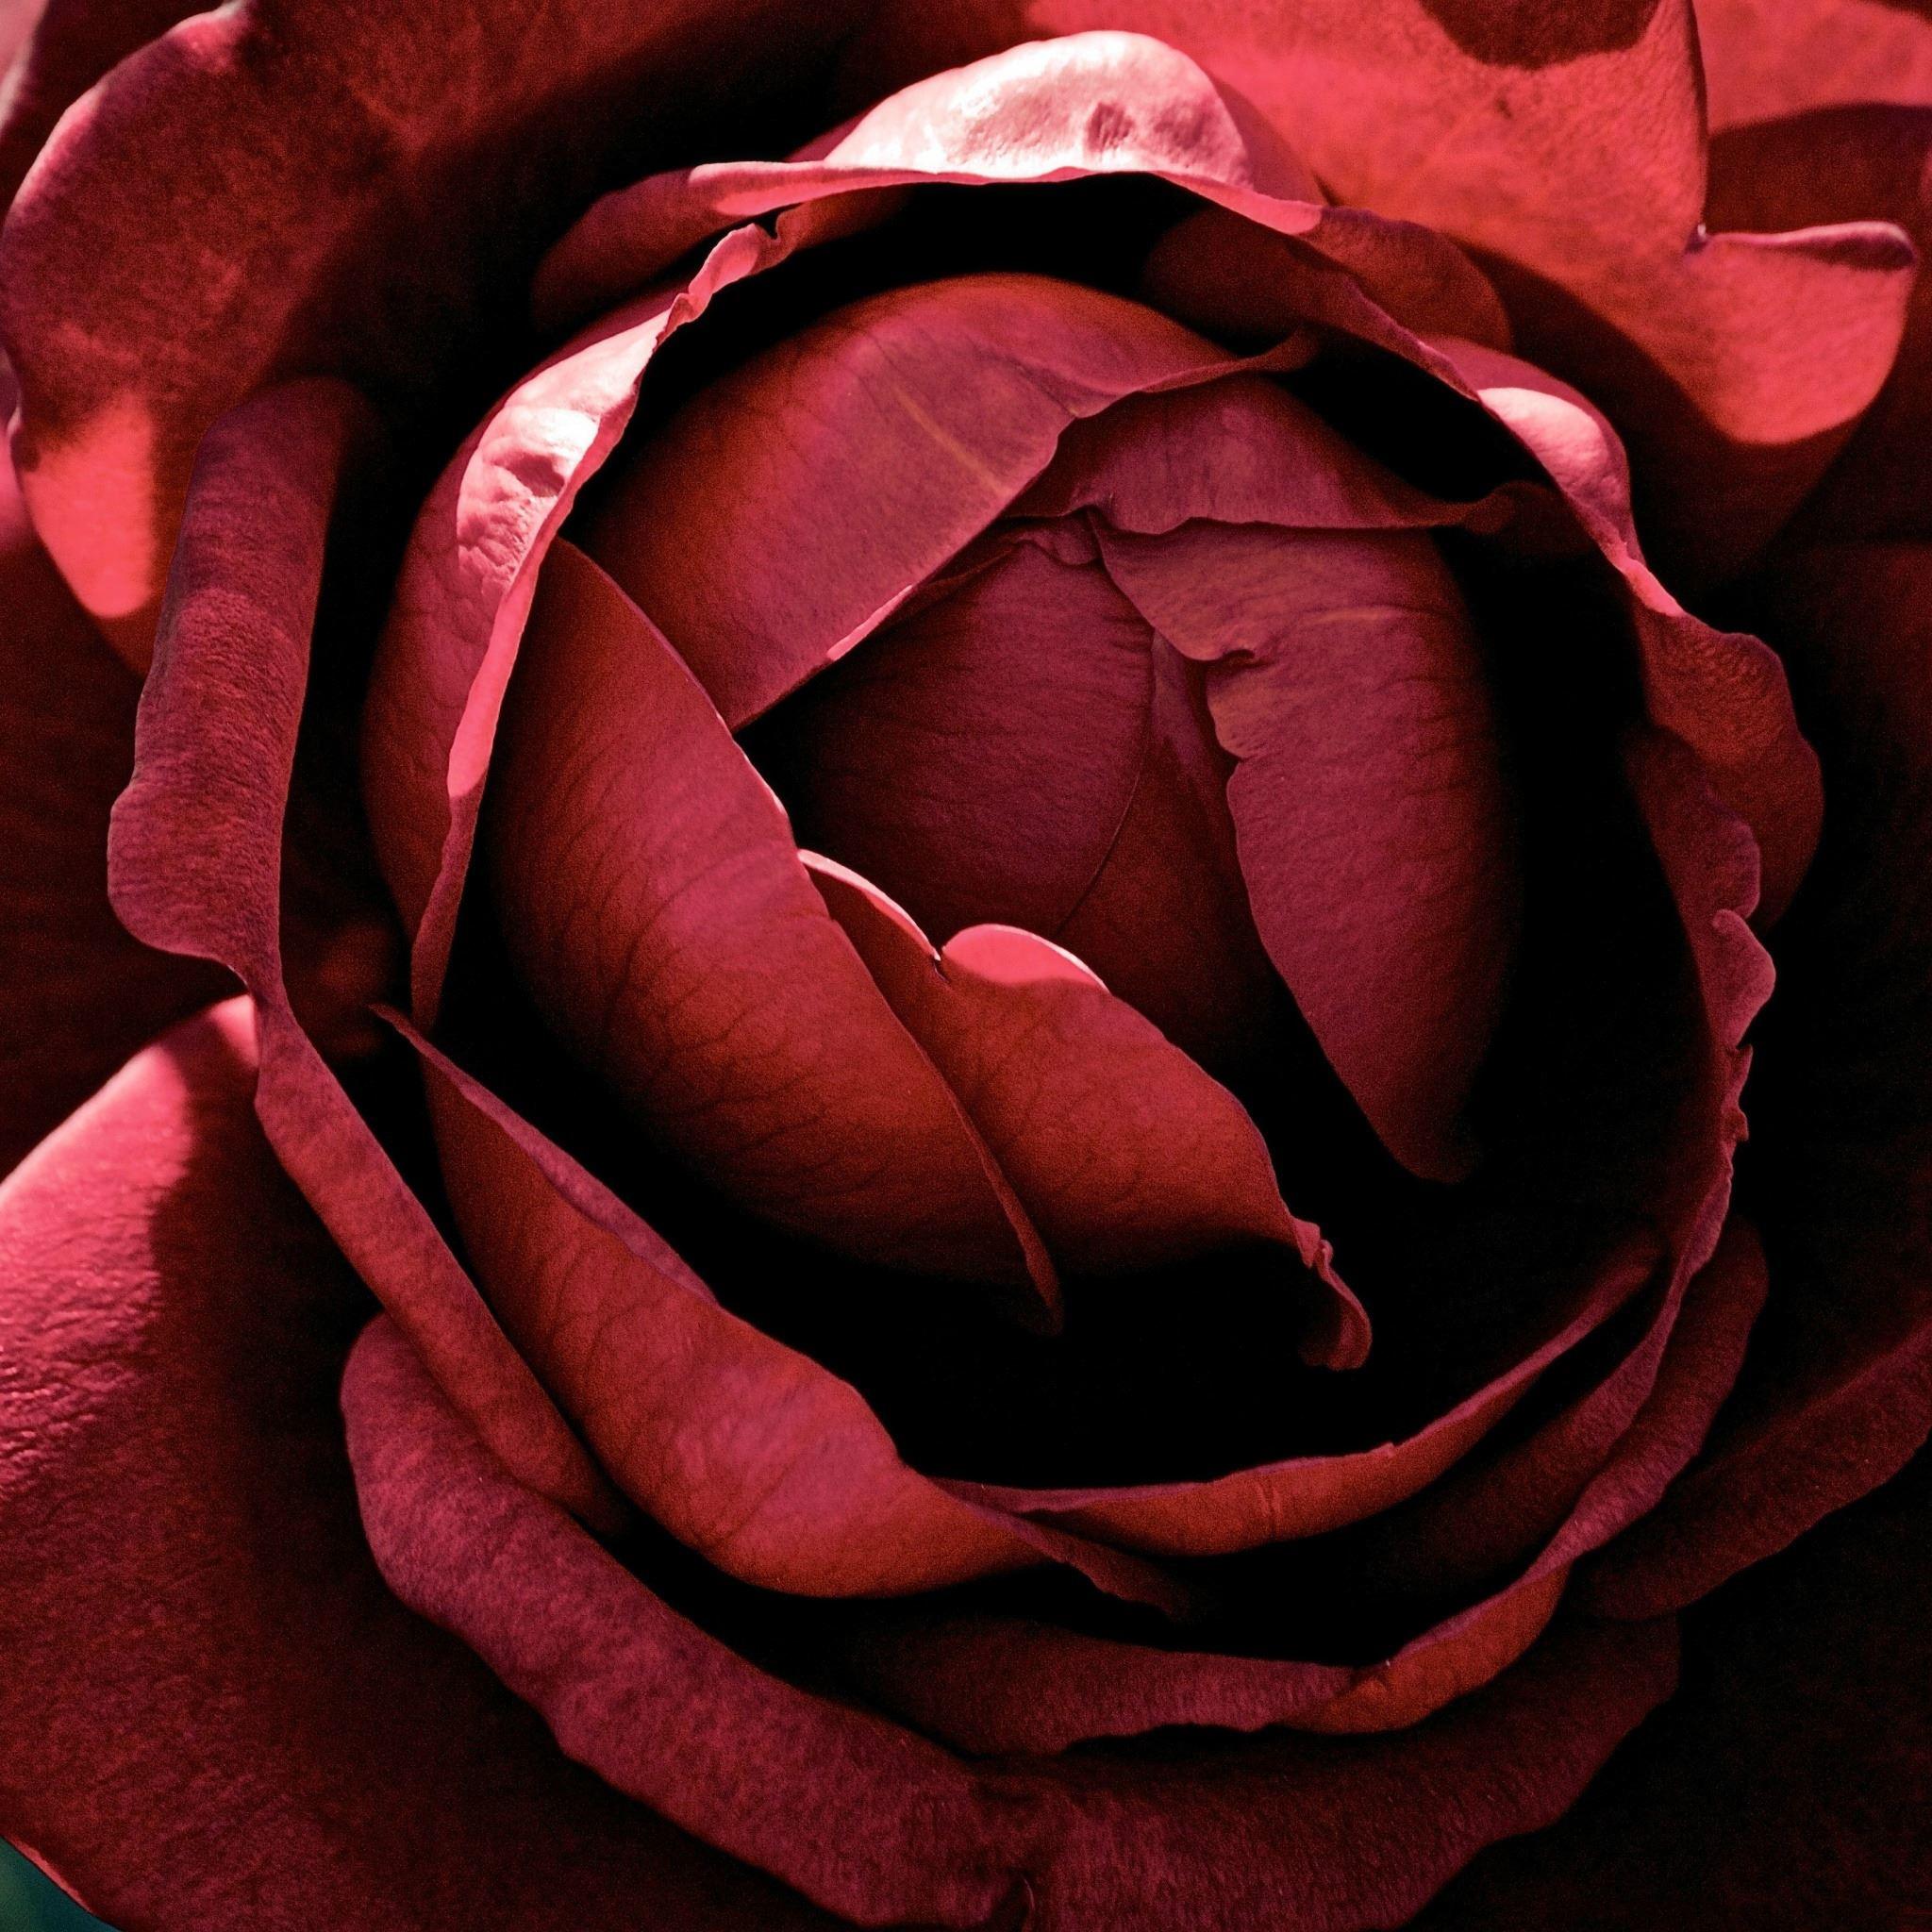 Dark red rose aesthetic